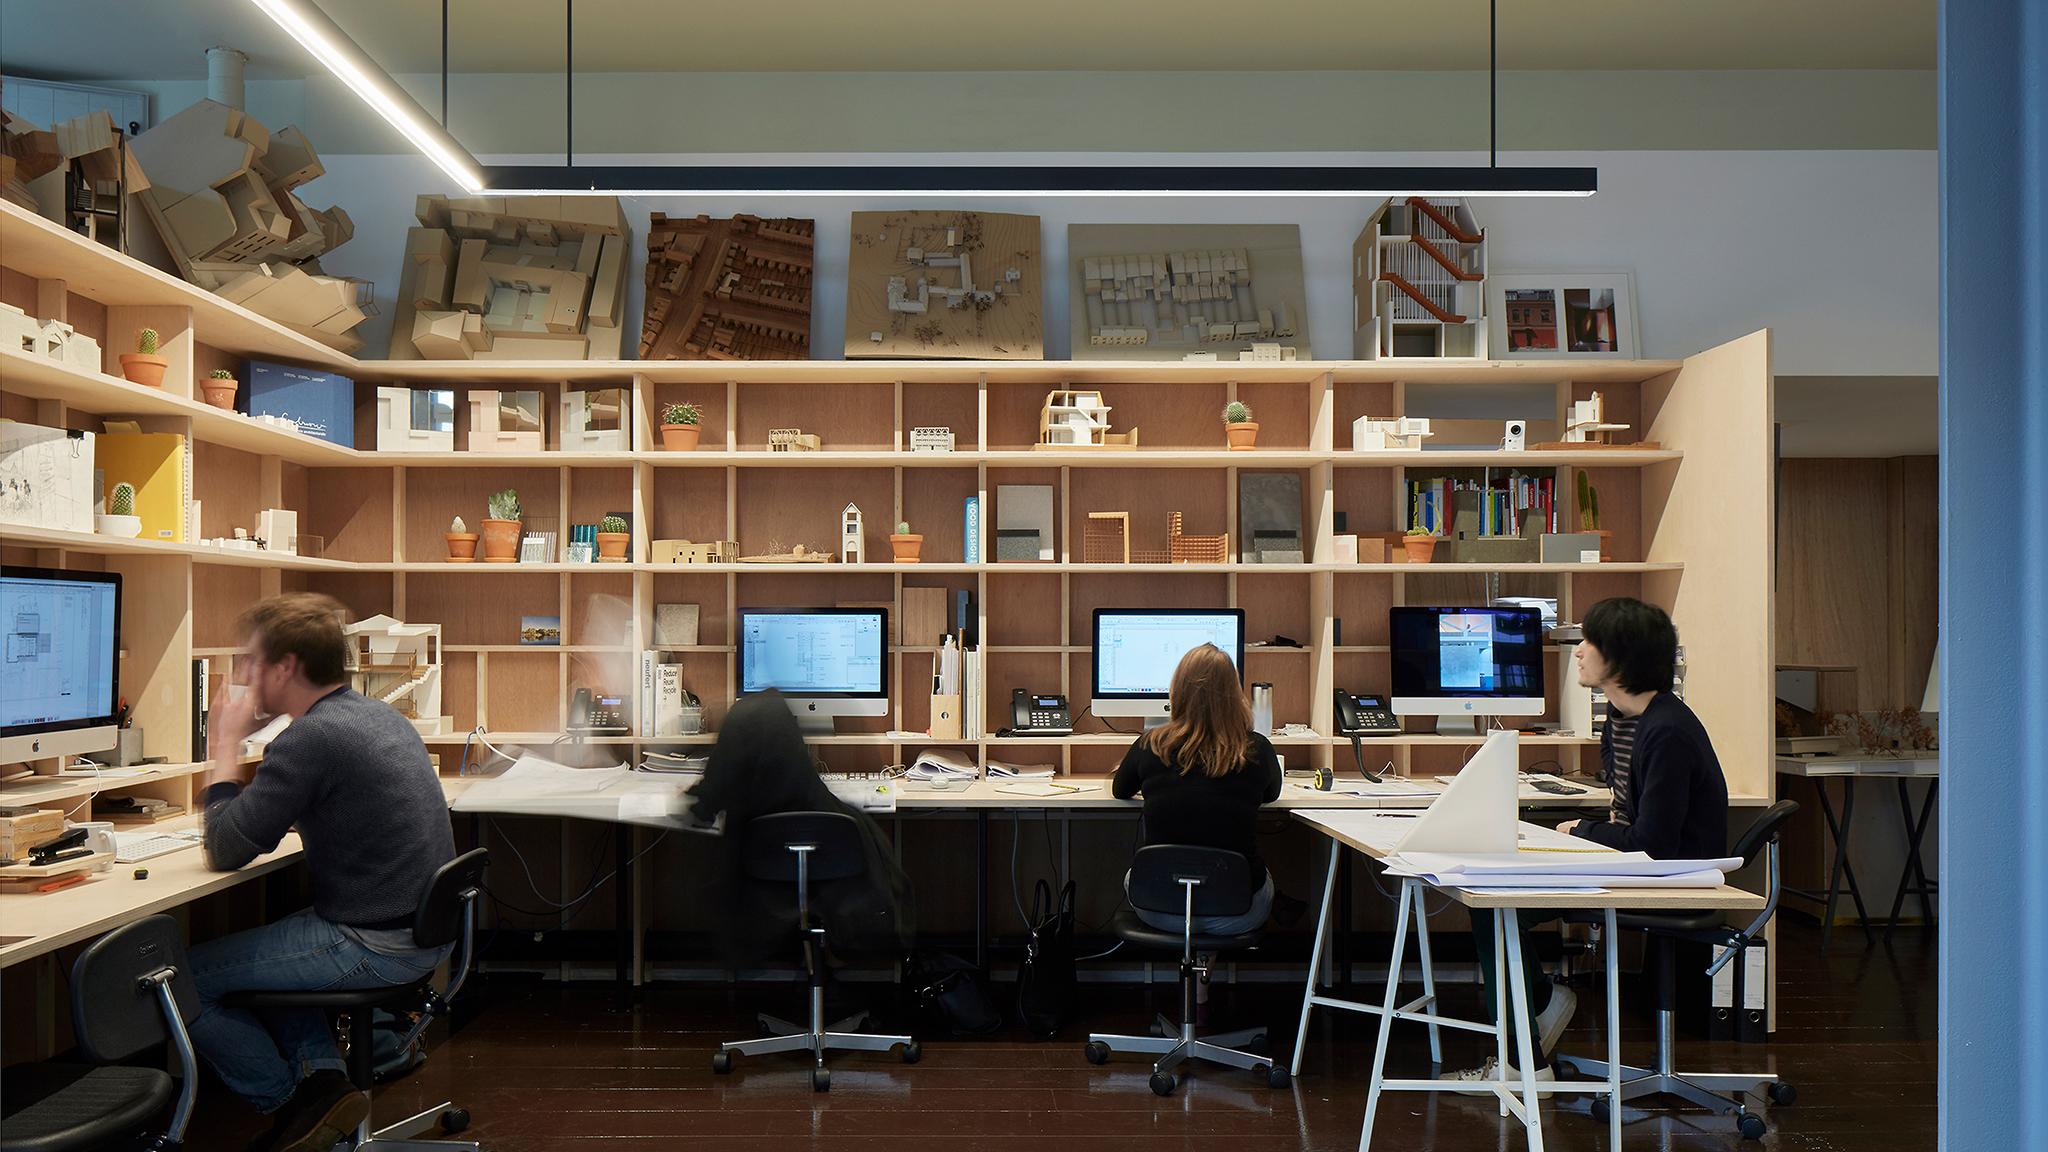 Jonathan Tuckey Design Architectural Studio